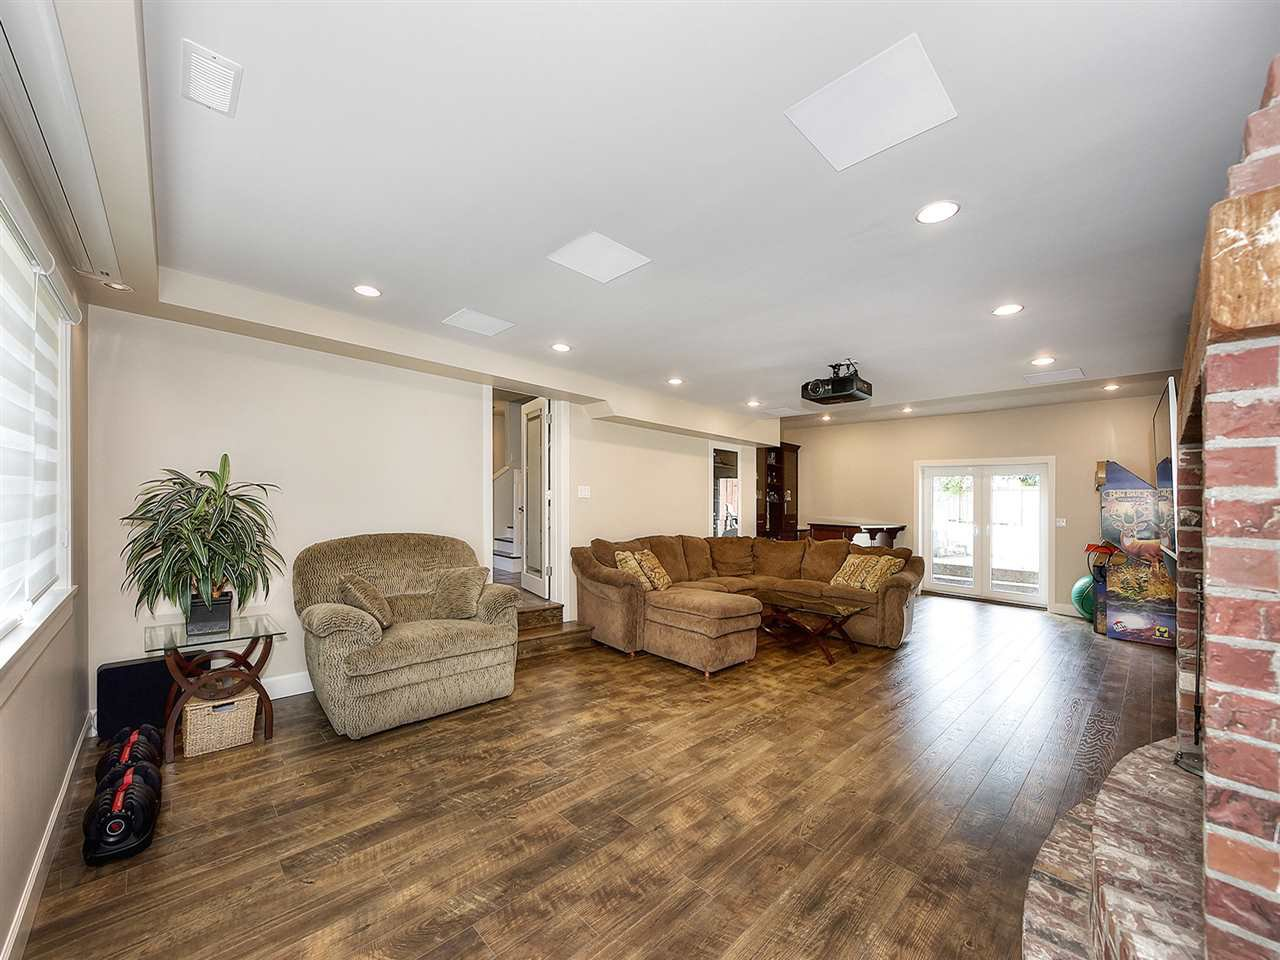 Photo 14: Photos: 1067 WILMINGTON Drive in Delta: Tsawwassen Central House for sale (Tsawwassen)  : MLS®# R2090180